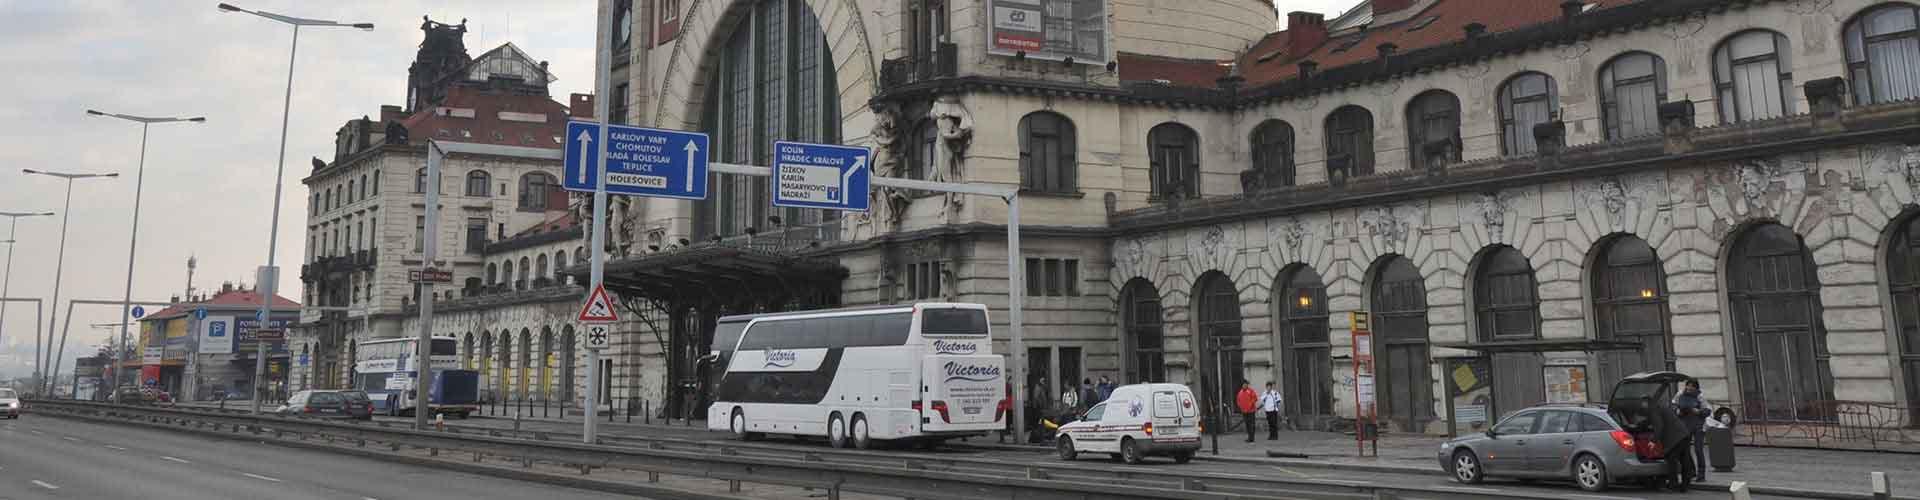 Praga - Campamentos cerca a Estación de tren de Hlavní nádraží. Mapas de Praga, Fotos y comentarios de cada Campamento en Praga.